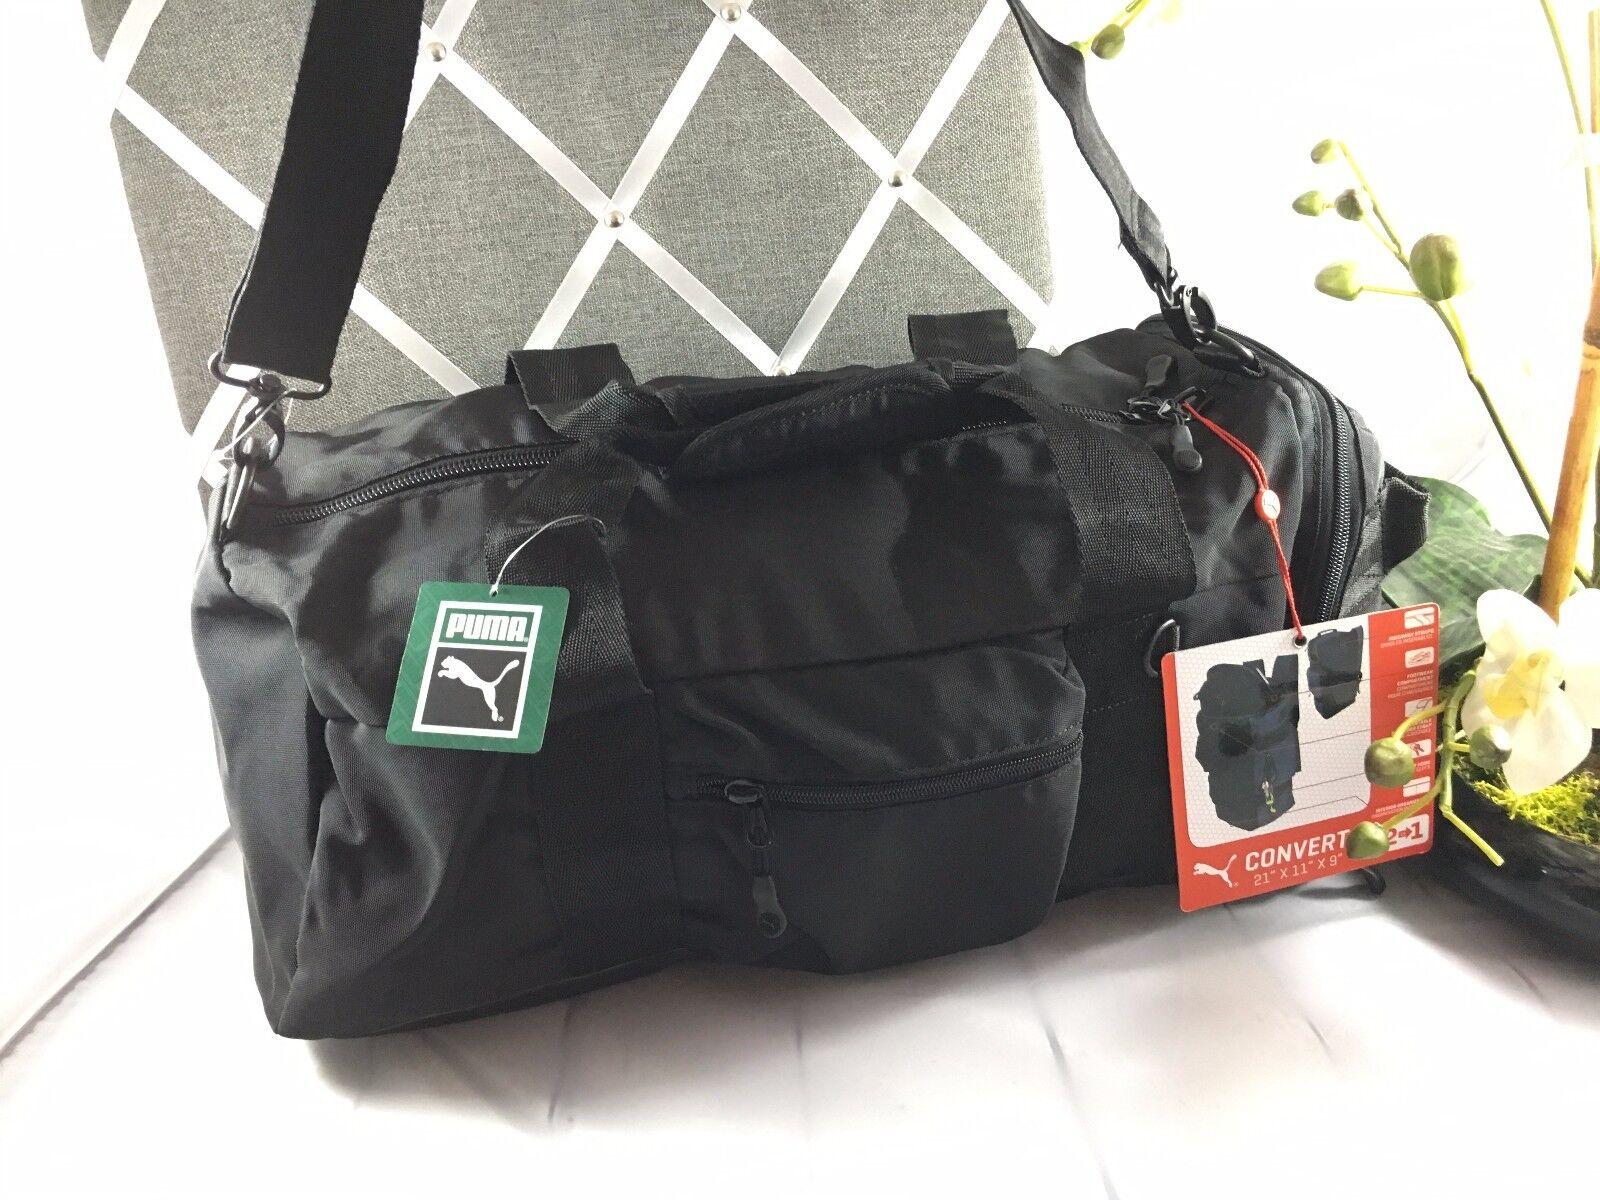 NWT PUMA Mainline CONVERT HYBRID DUFFEL BAG pick color Backpack Duffel 2 in  1   eBay 9f07c8901b